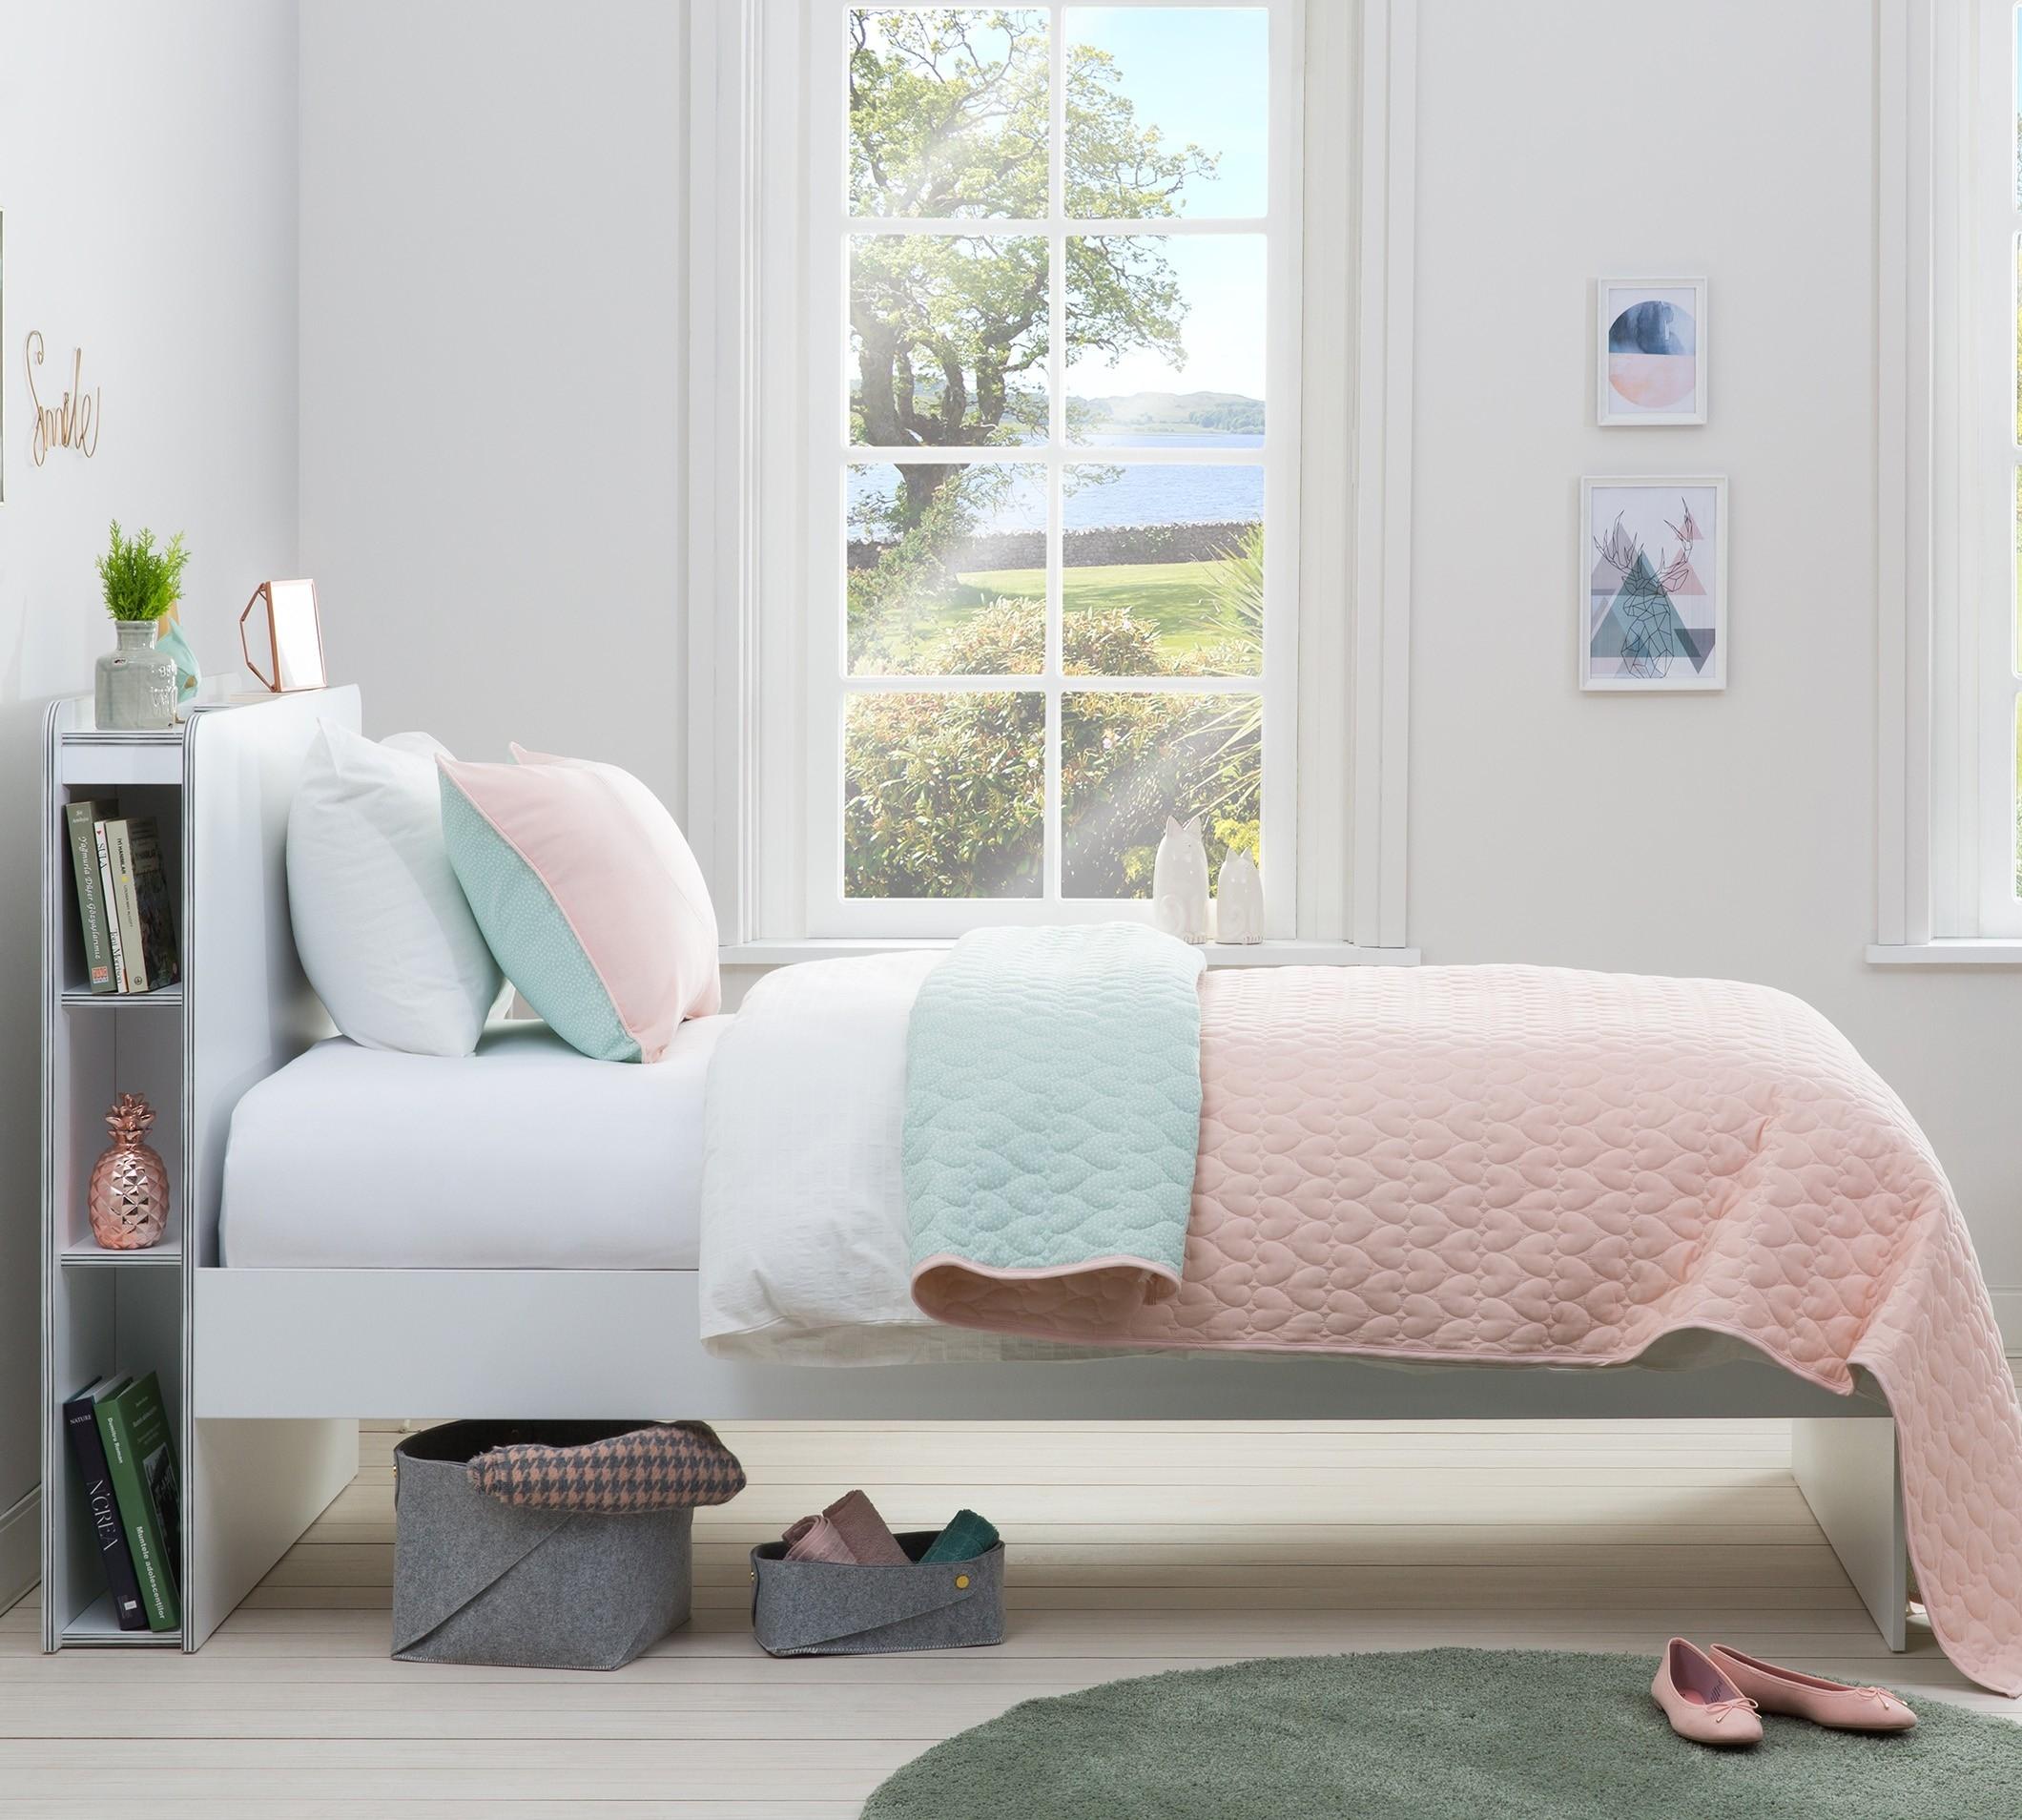 Set cuvertura reversibila pat copii si fata de perna Ducky Pink / Mint, 145 x 230 cm imagine